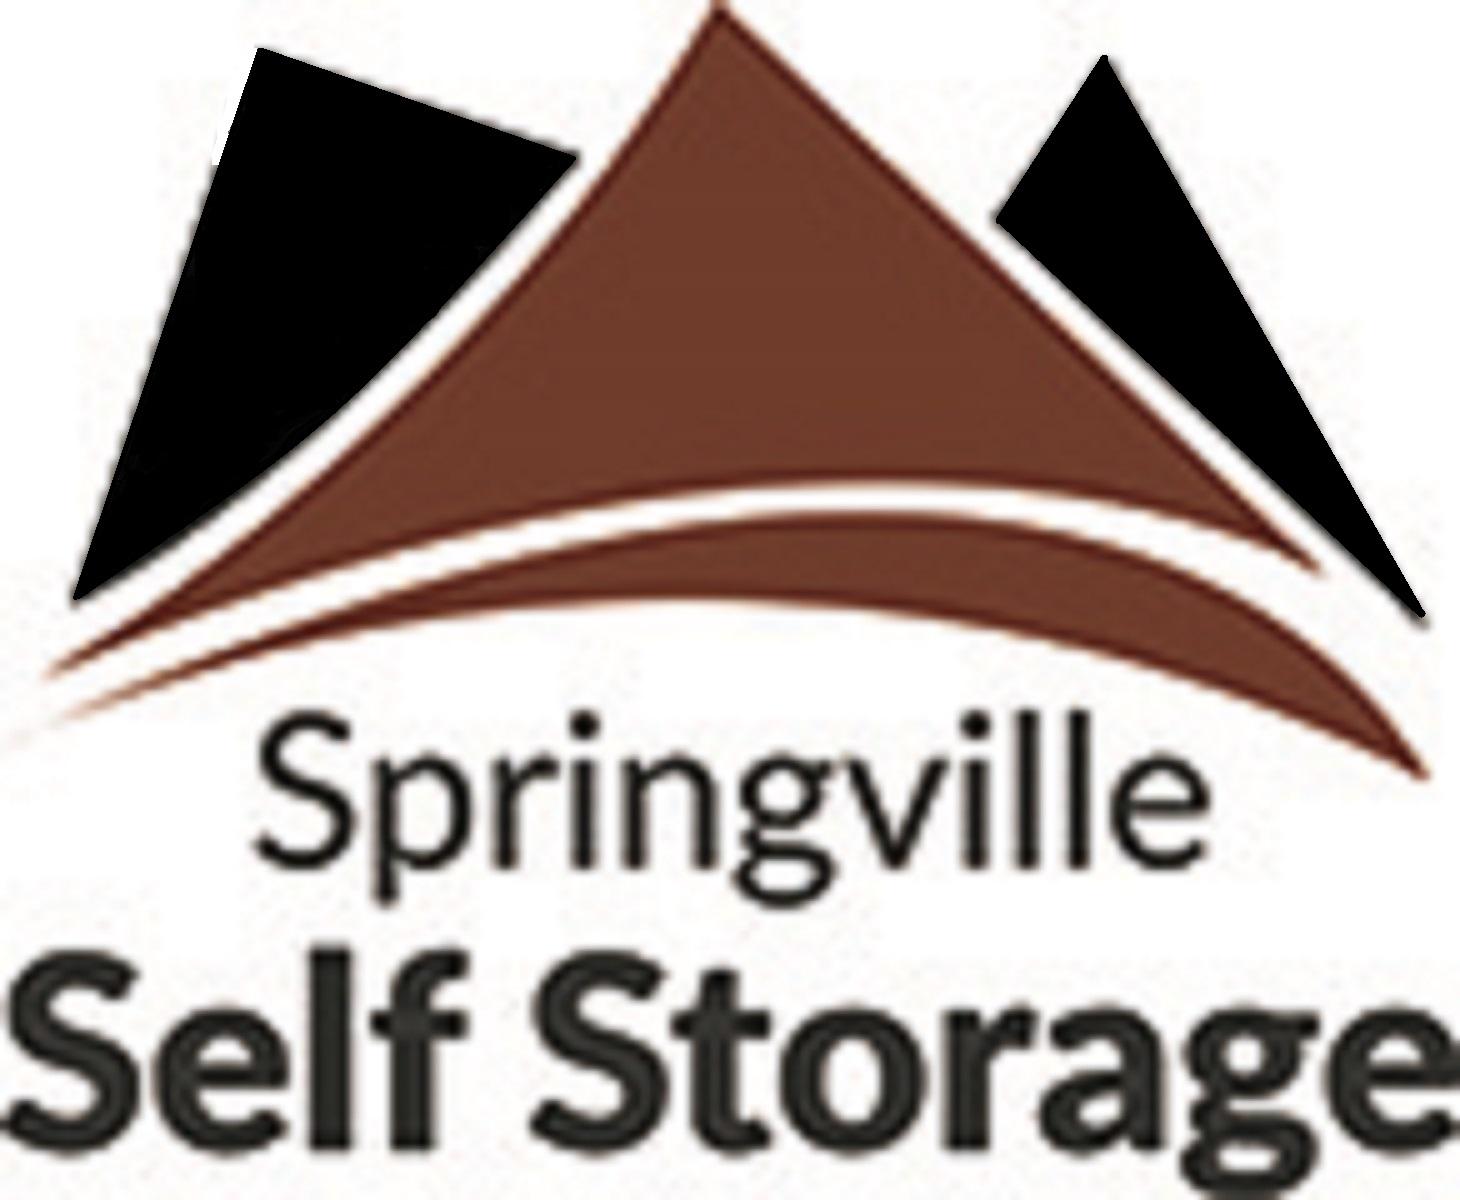 Springville Self Storage